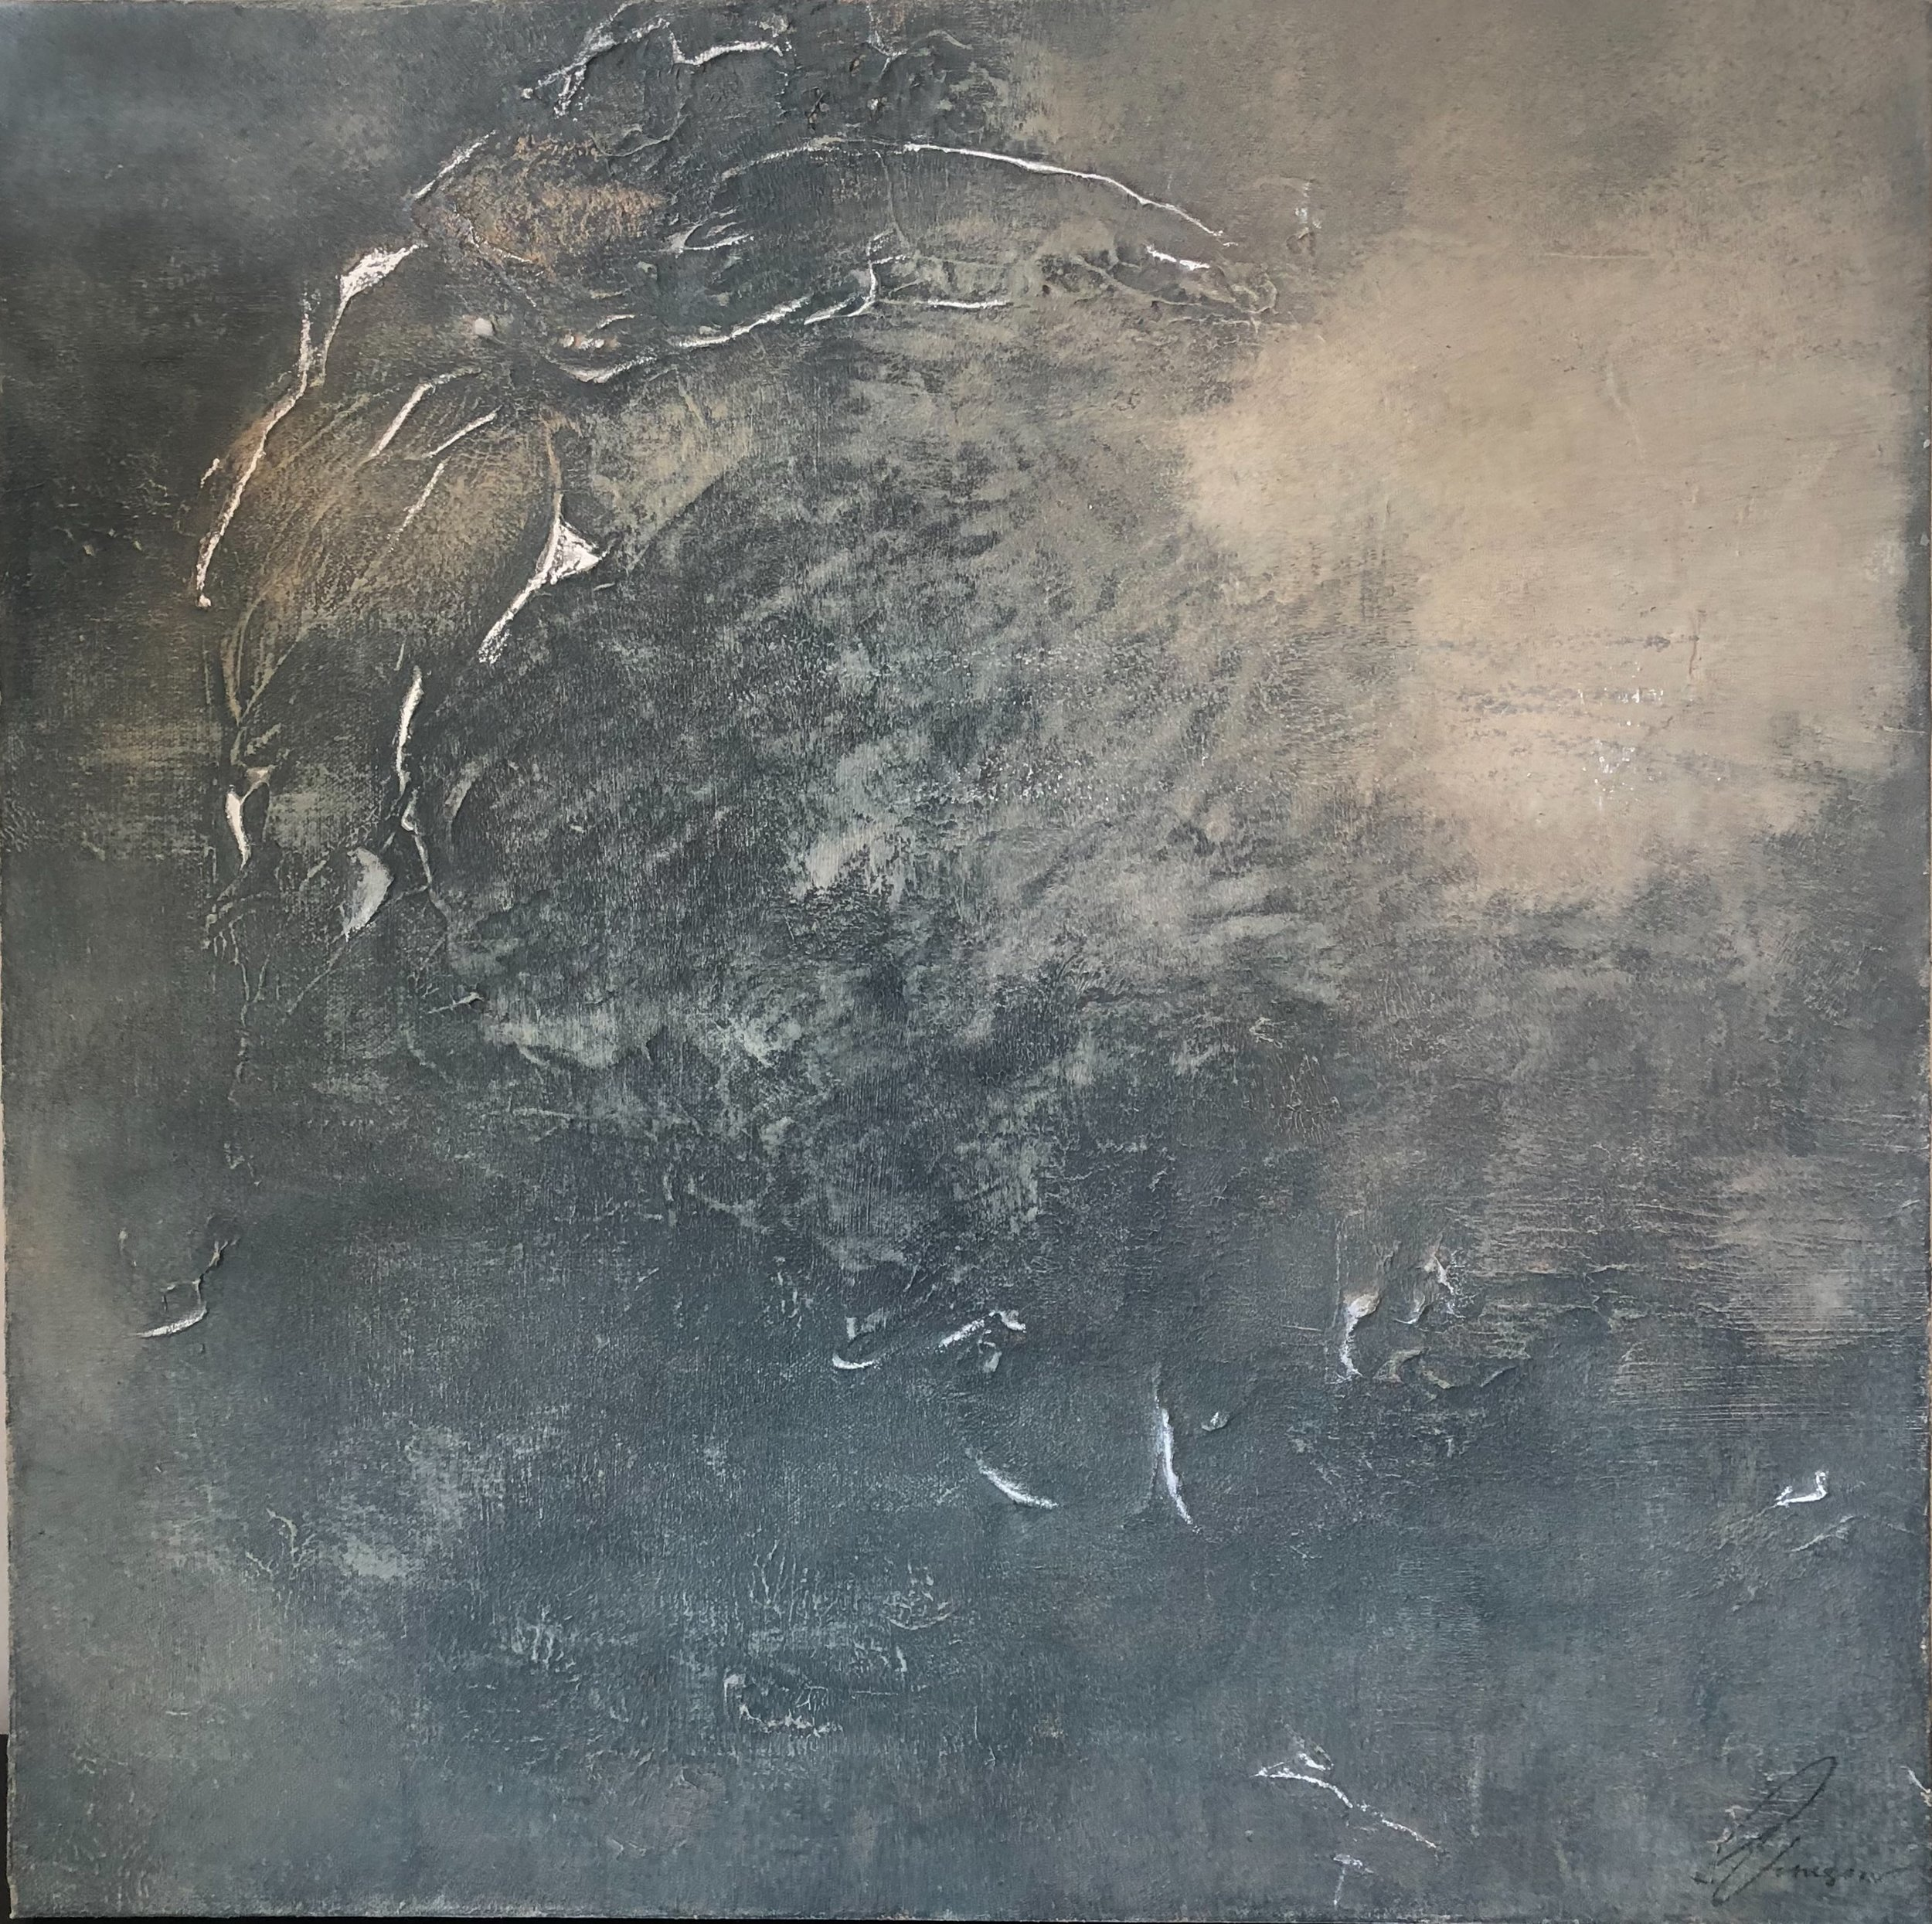 WATERWAYS - mixed media on canvas | 24 x 24